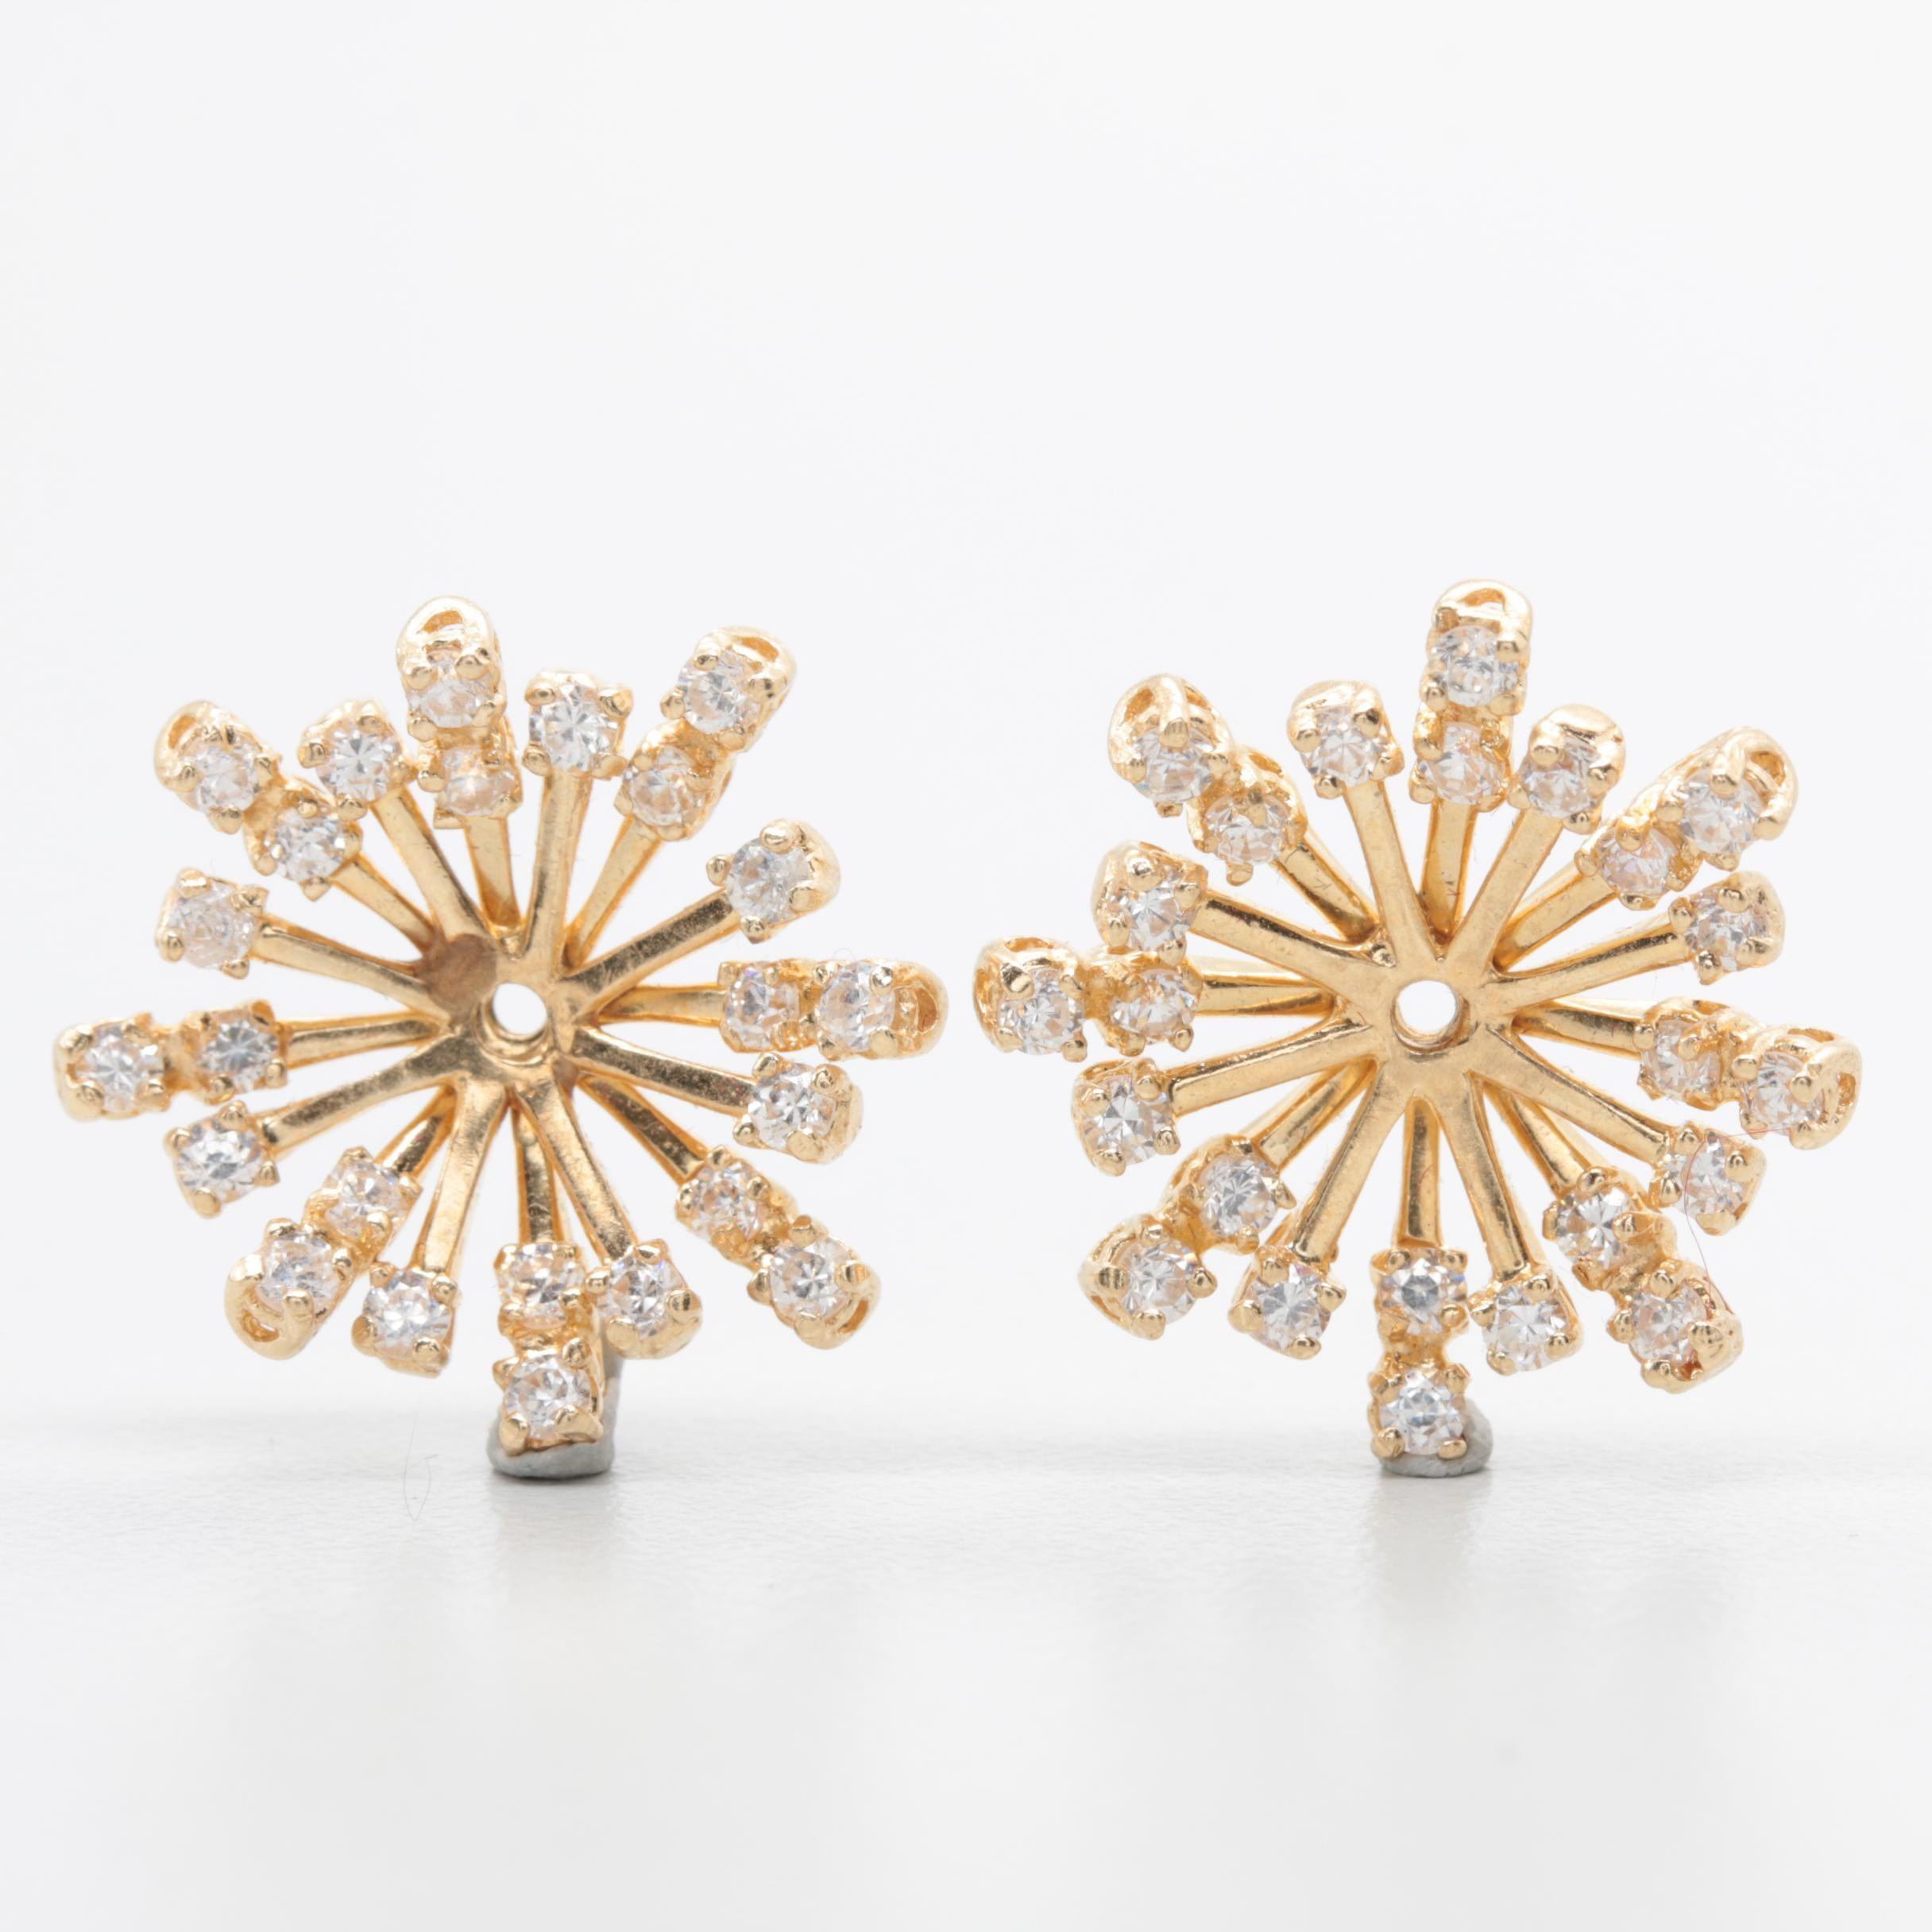 14K Yellow Gold Cubic Zirconia Earring Jackets